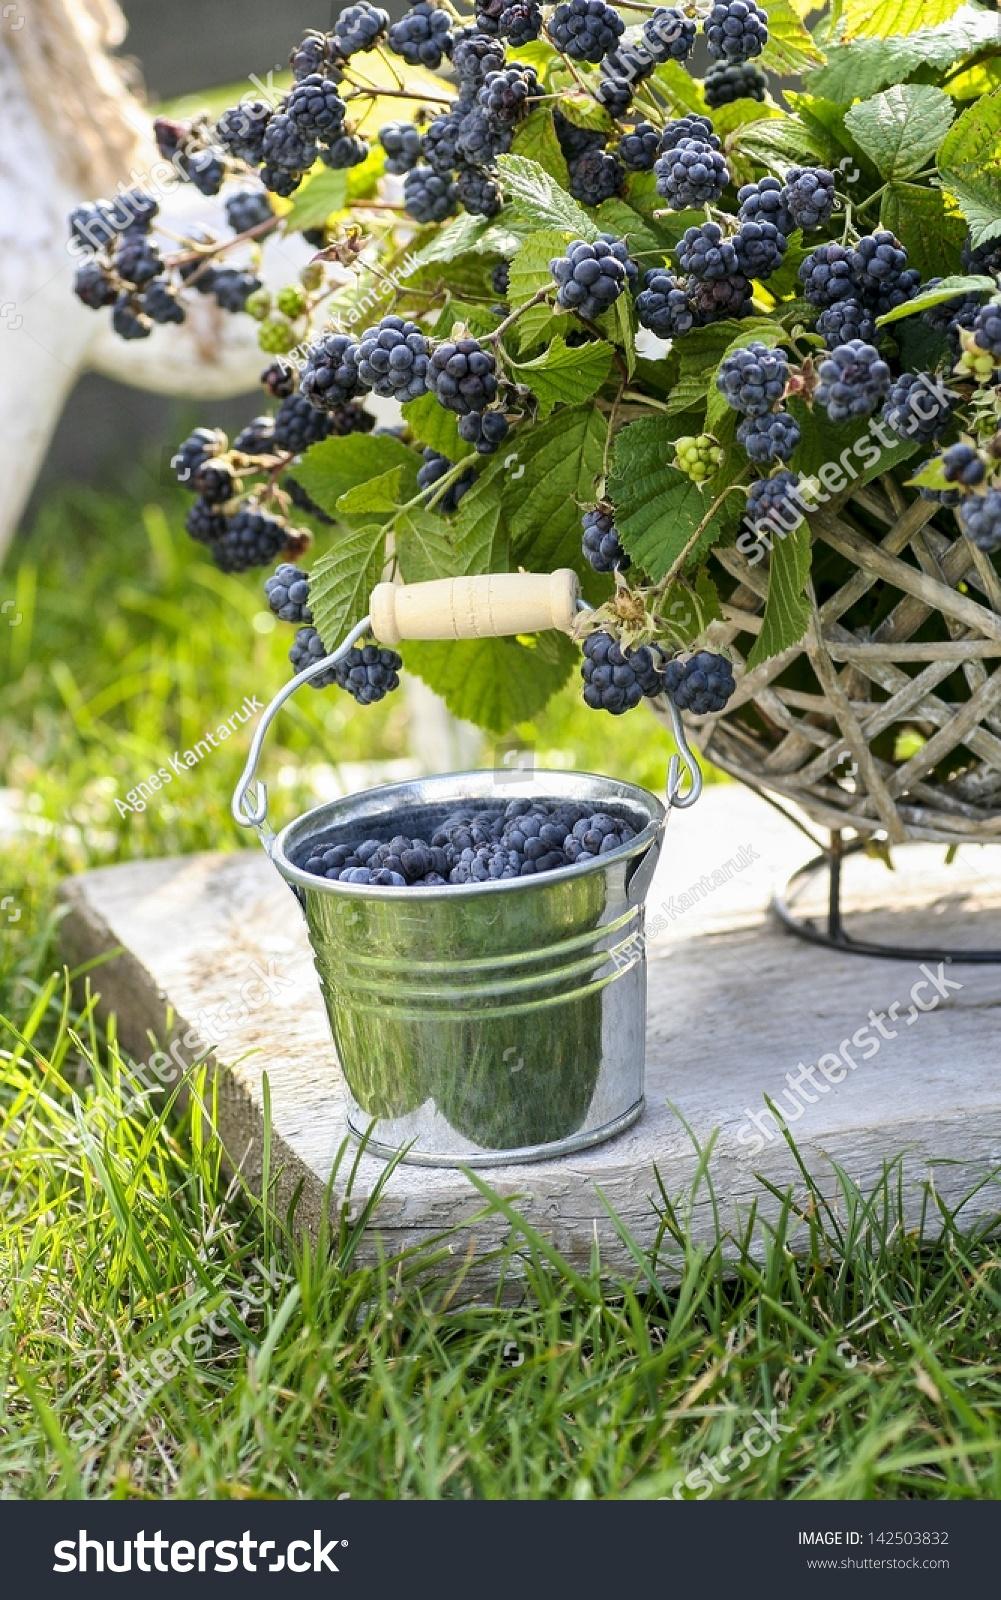 how to grow blackberries in a hanging basket